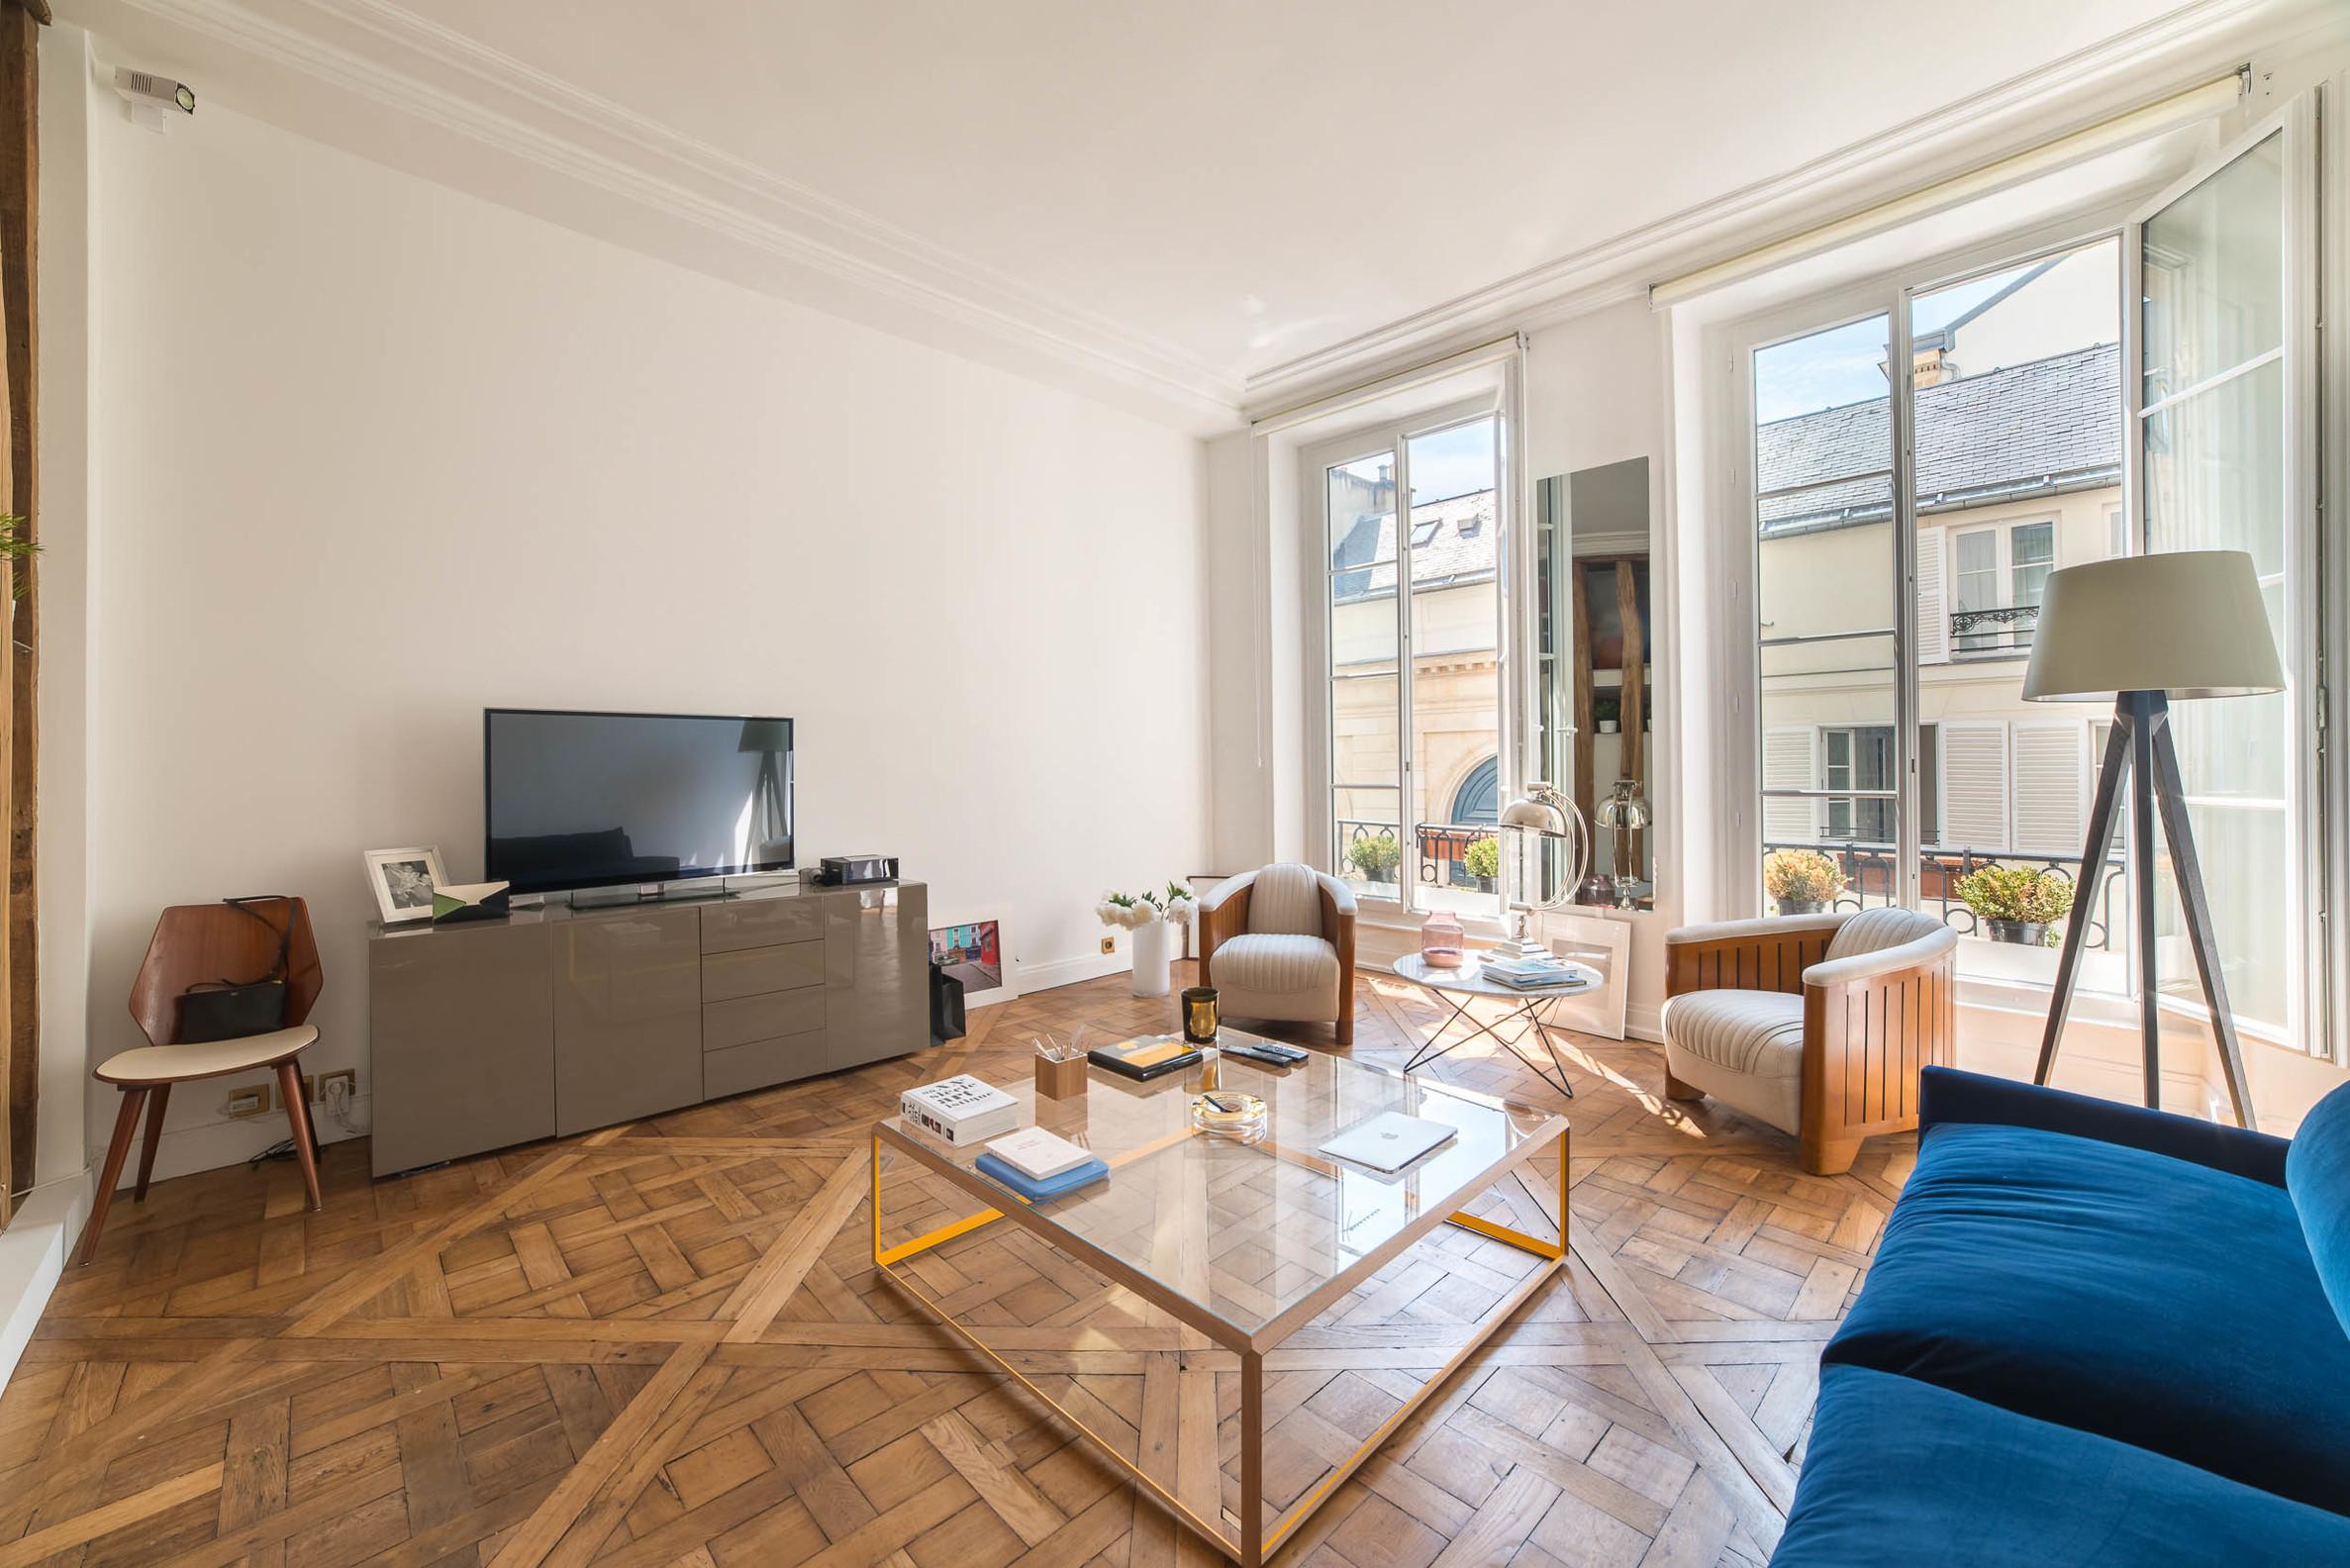 Apartamento por un Venta en Rue de Bourgogne CS 43 rue de Bourgogne Paris, Paris 75007 Francia